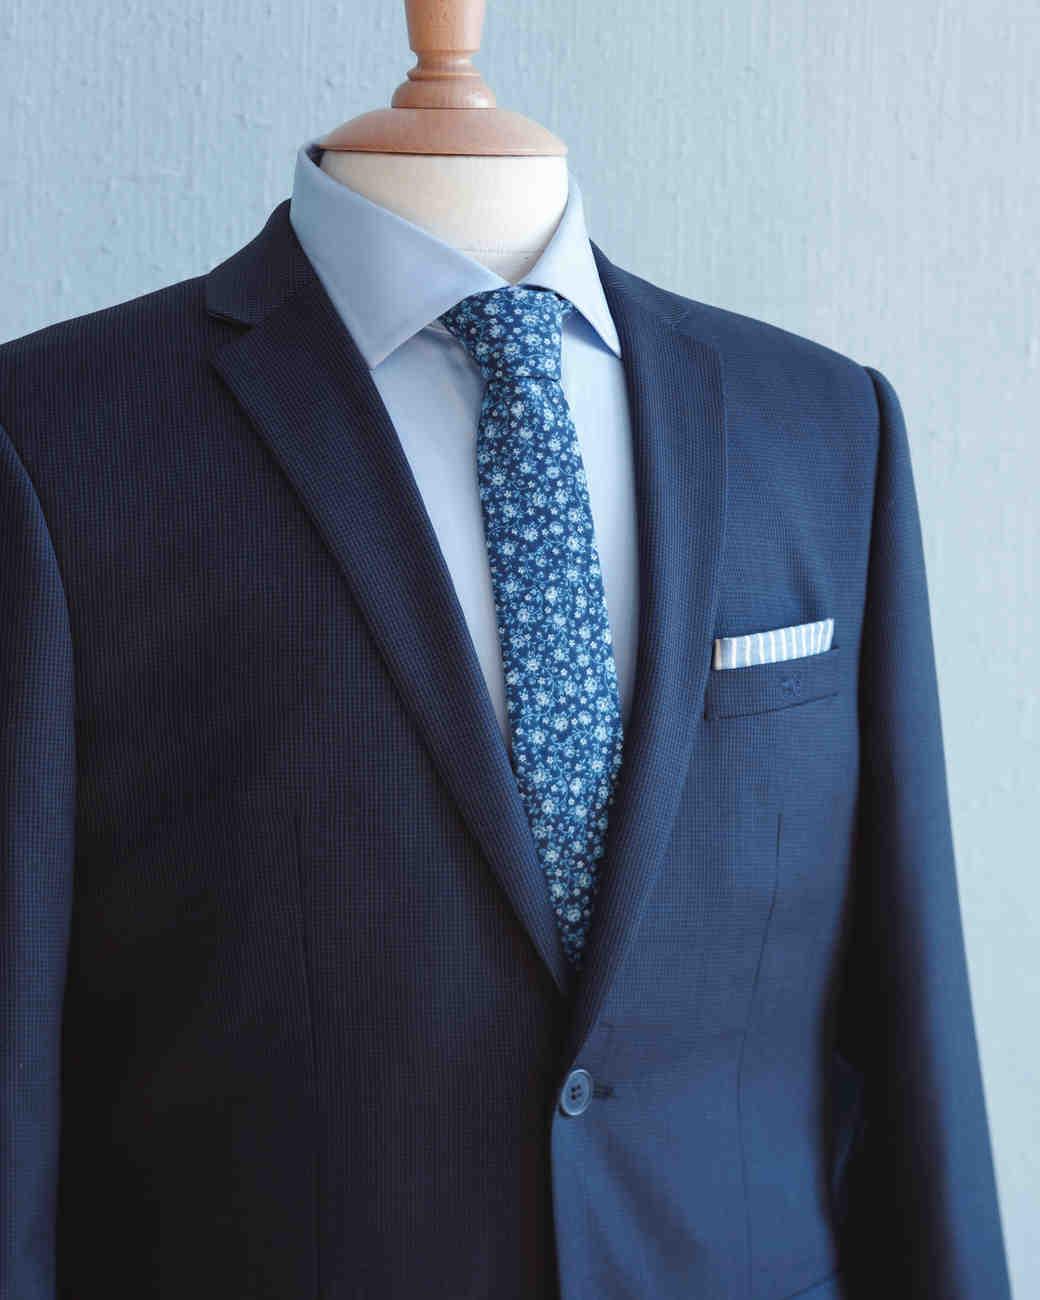 palette-blue-tie-pocket-mwd108489.jpg